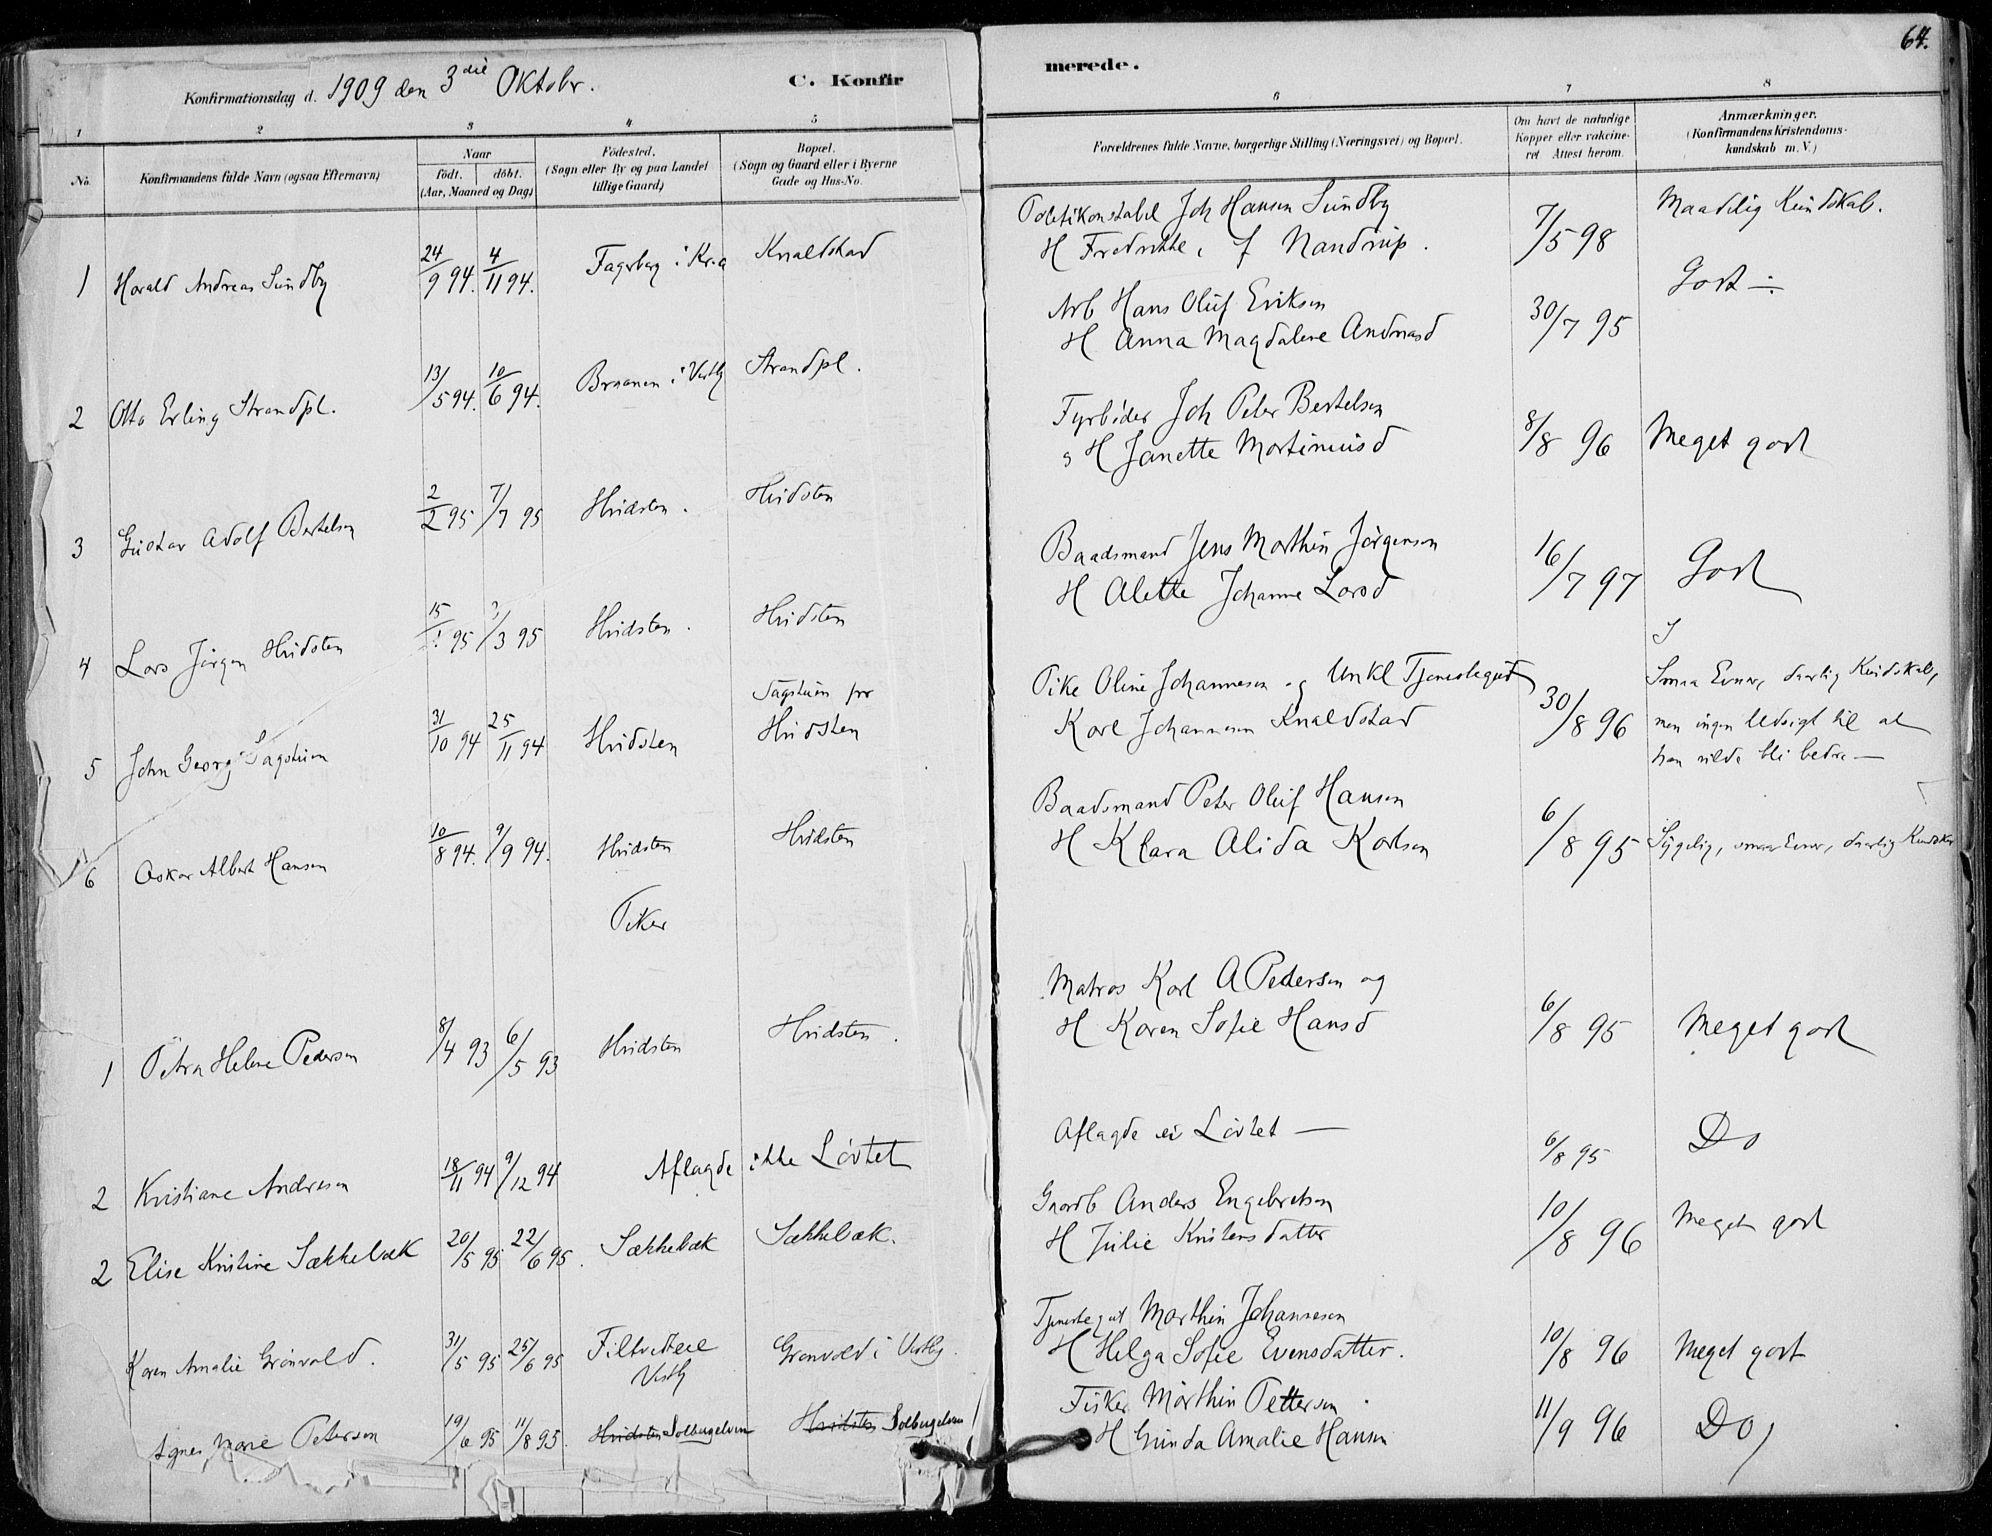 SAO, Vestby prestekontor Kirkebøker, F/Fd/L0001: Ministerialbok nr. IV 1, 1878-1945, s. 64